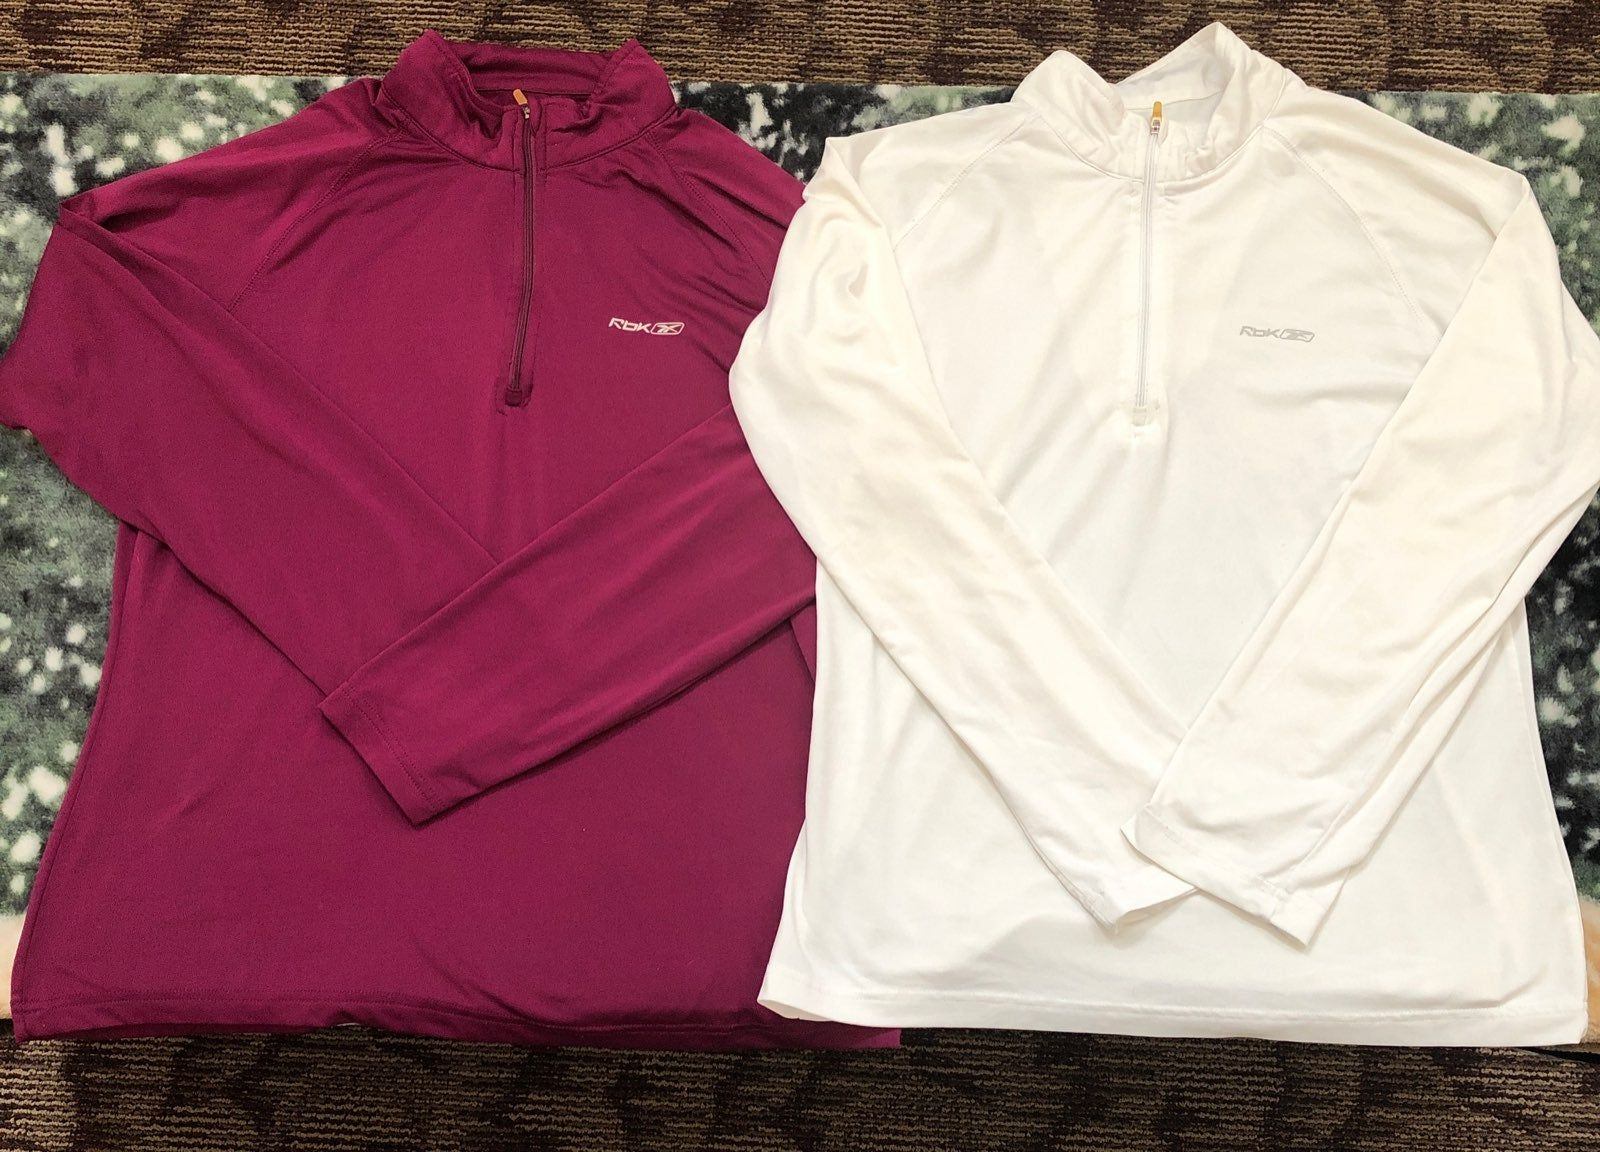 Reebok Rbk Active Wear Shirts Size L Mercari In 2020 Active Wear Shirts Shirt Size Nike Jacket [ 1152 x 1600 Pixel ]